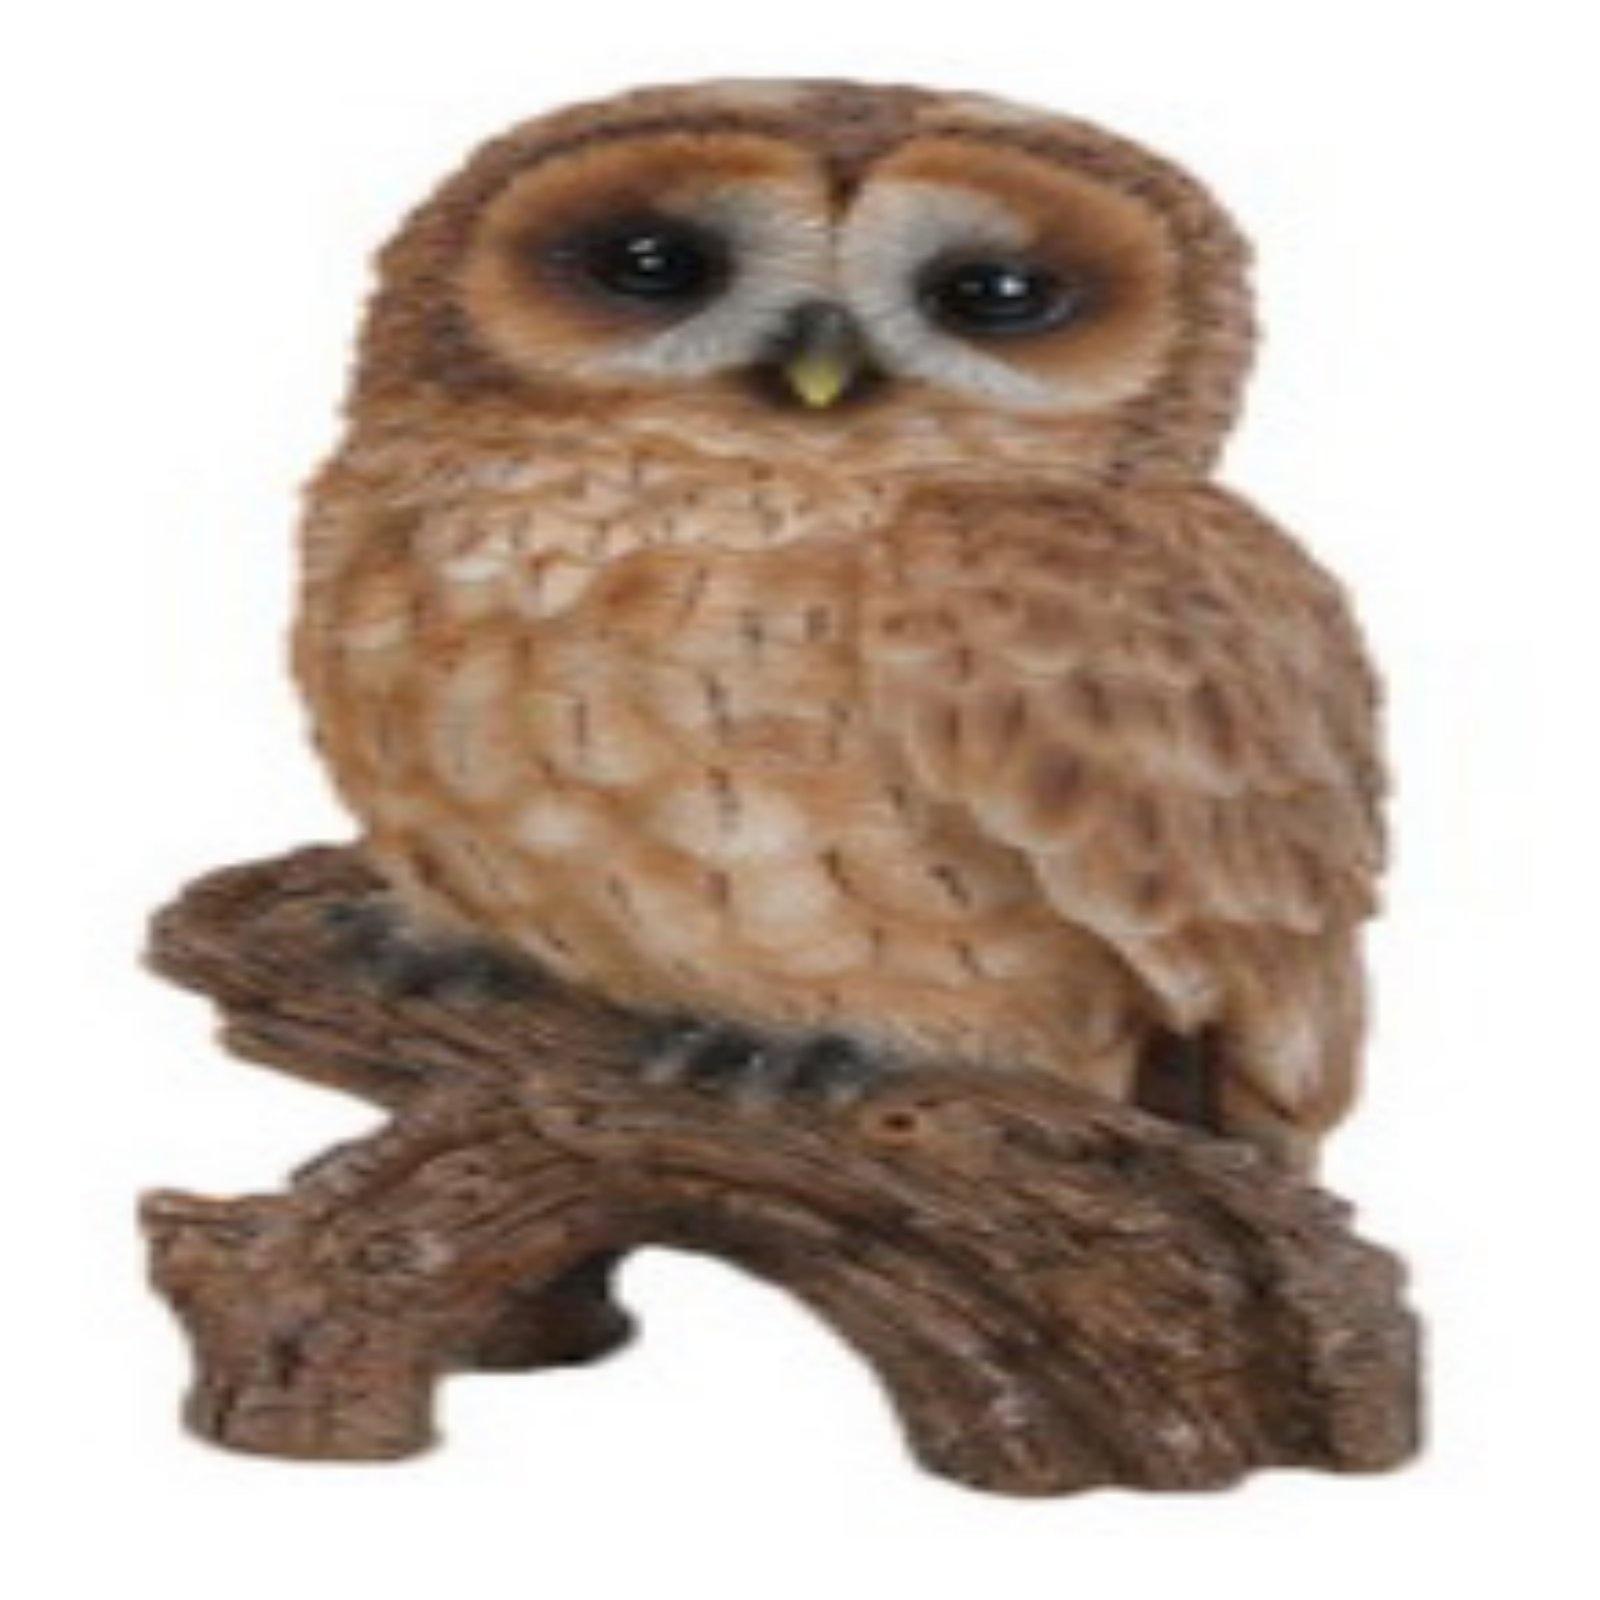 Owl Statues For Gardens Homeware: Buy Online from Fishpond.com.fj